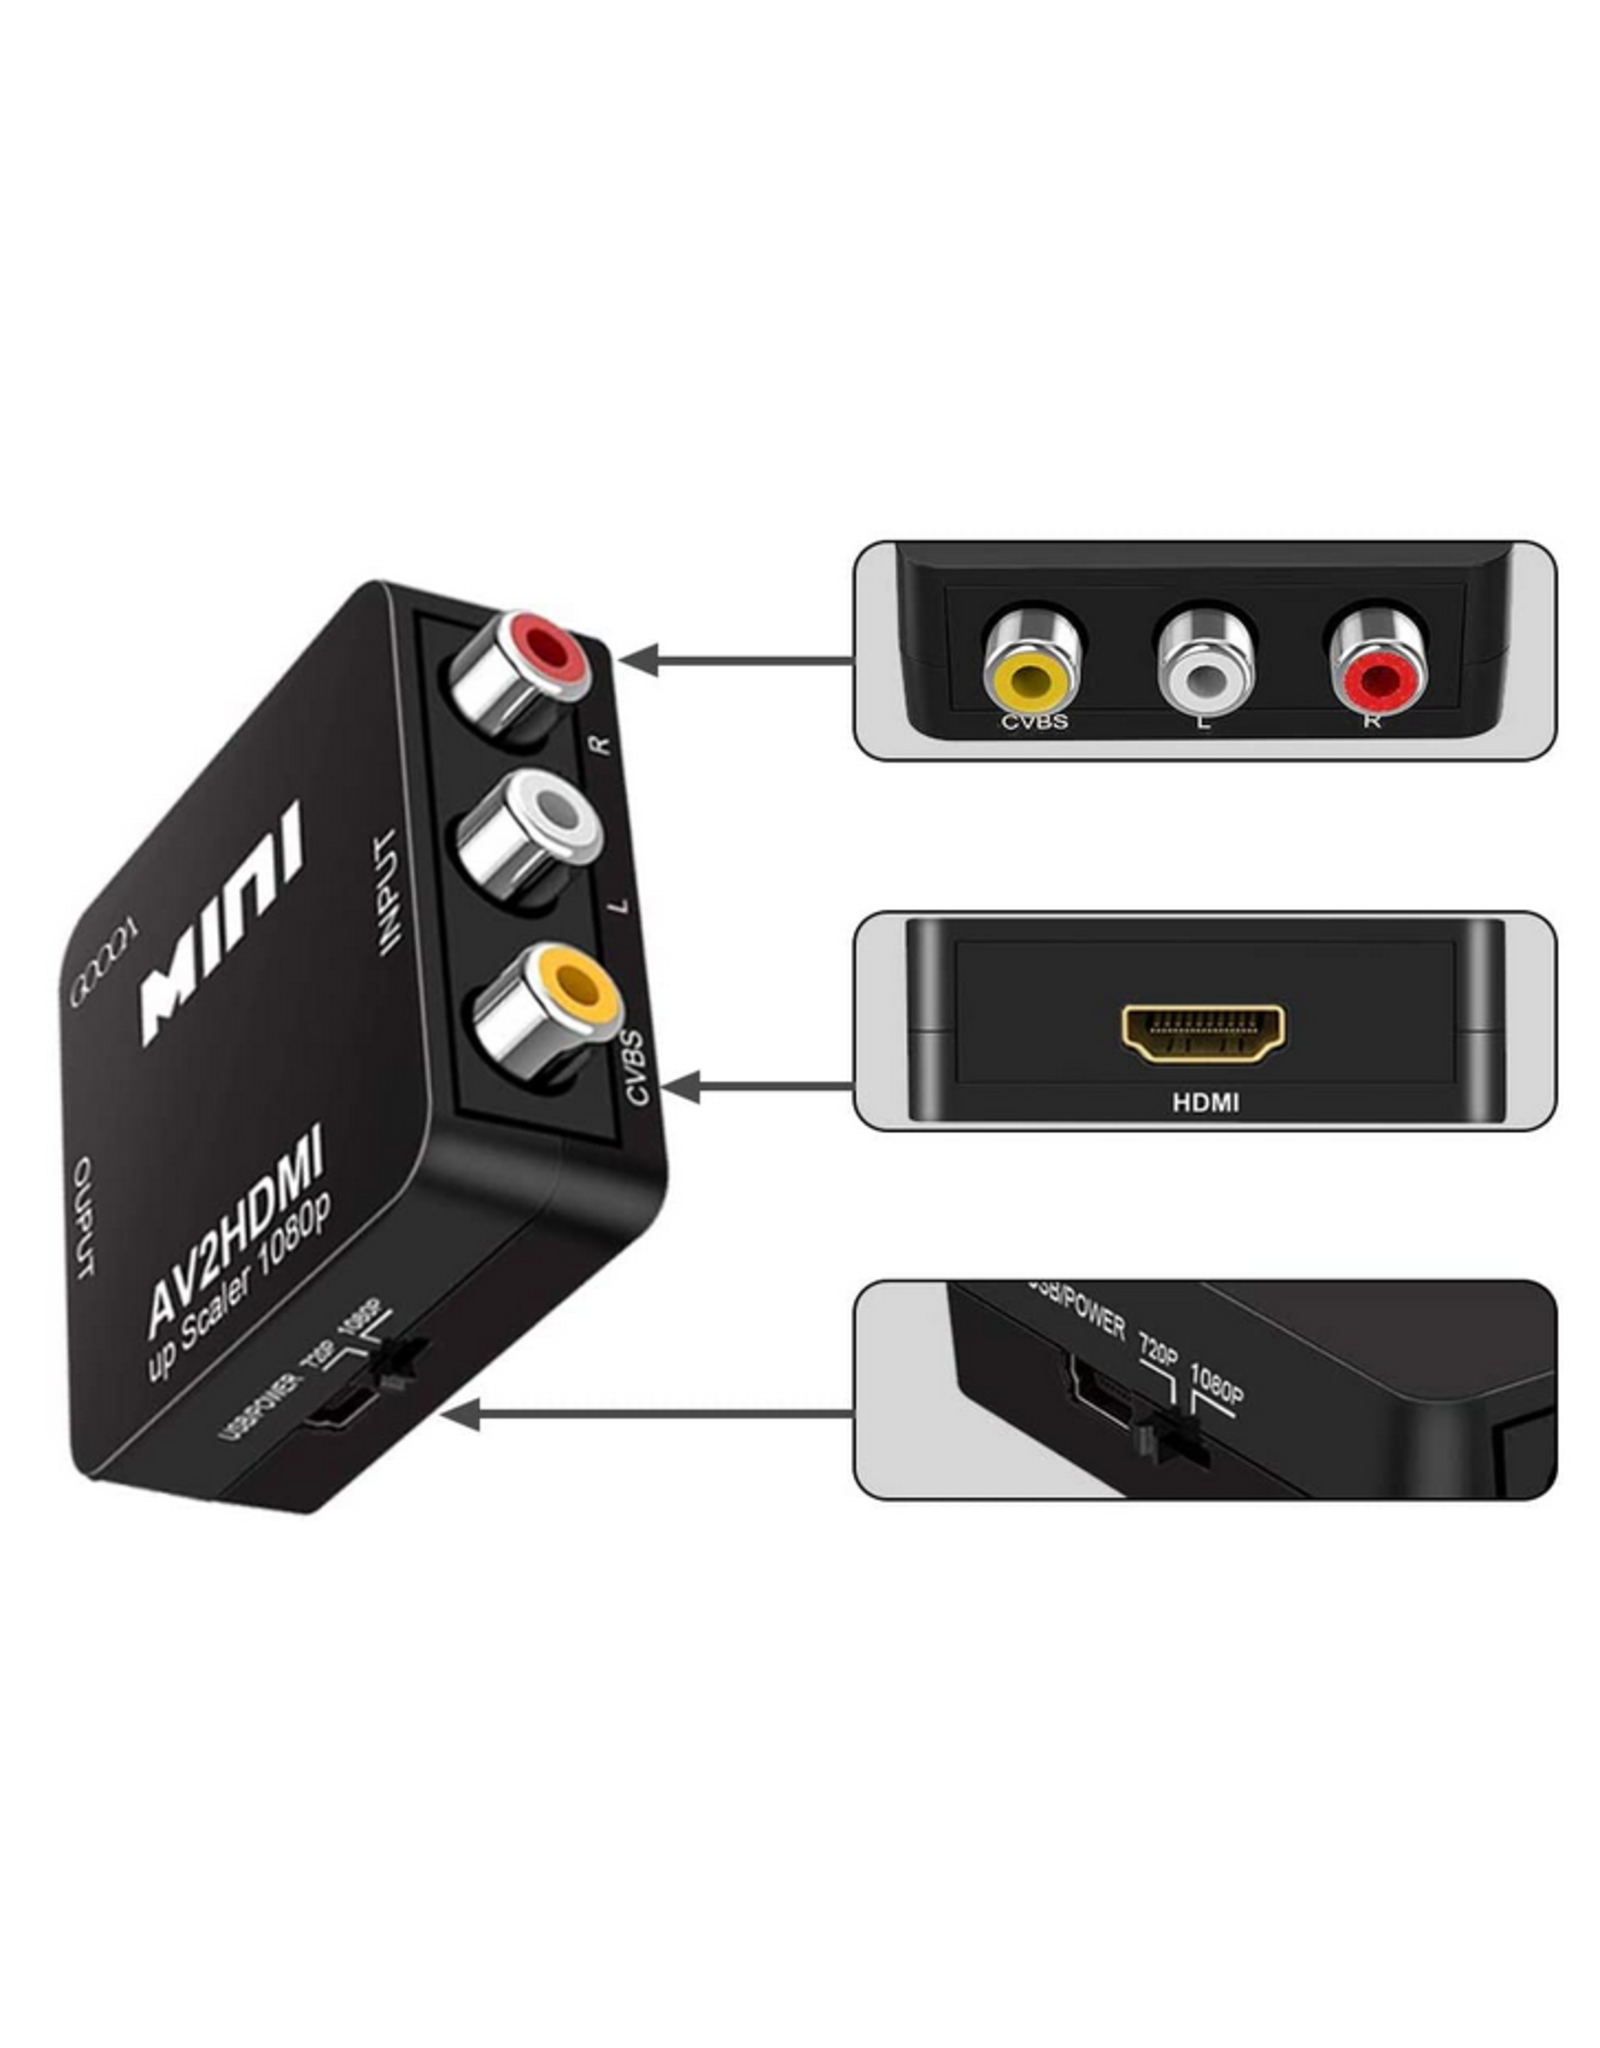 GOOOA Mini RCA to HDMI Converter